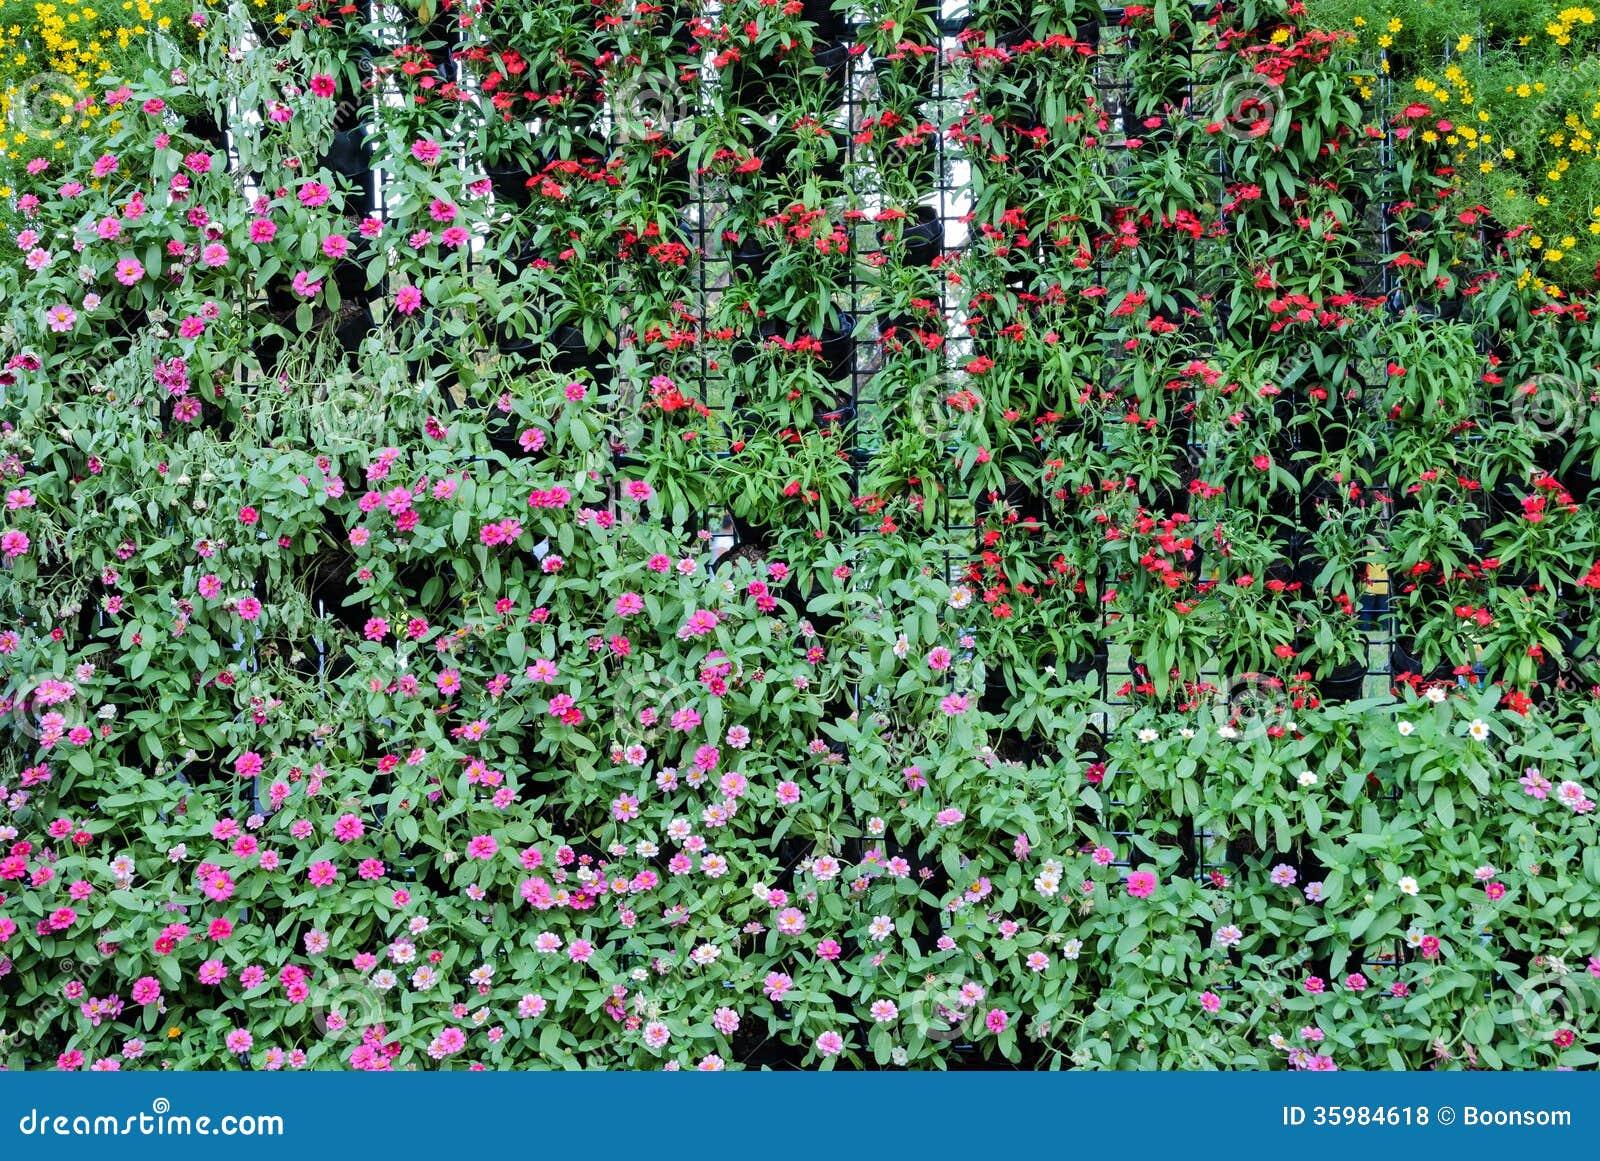 Flower garden wall royalty free stock photos image 35984618 for Flower wall garden